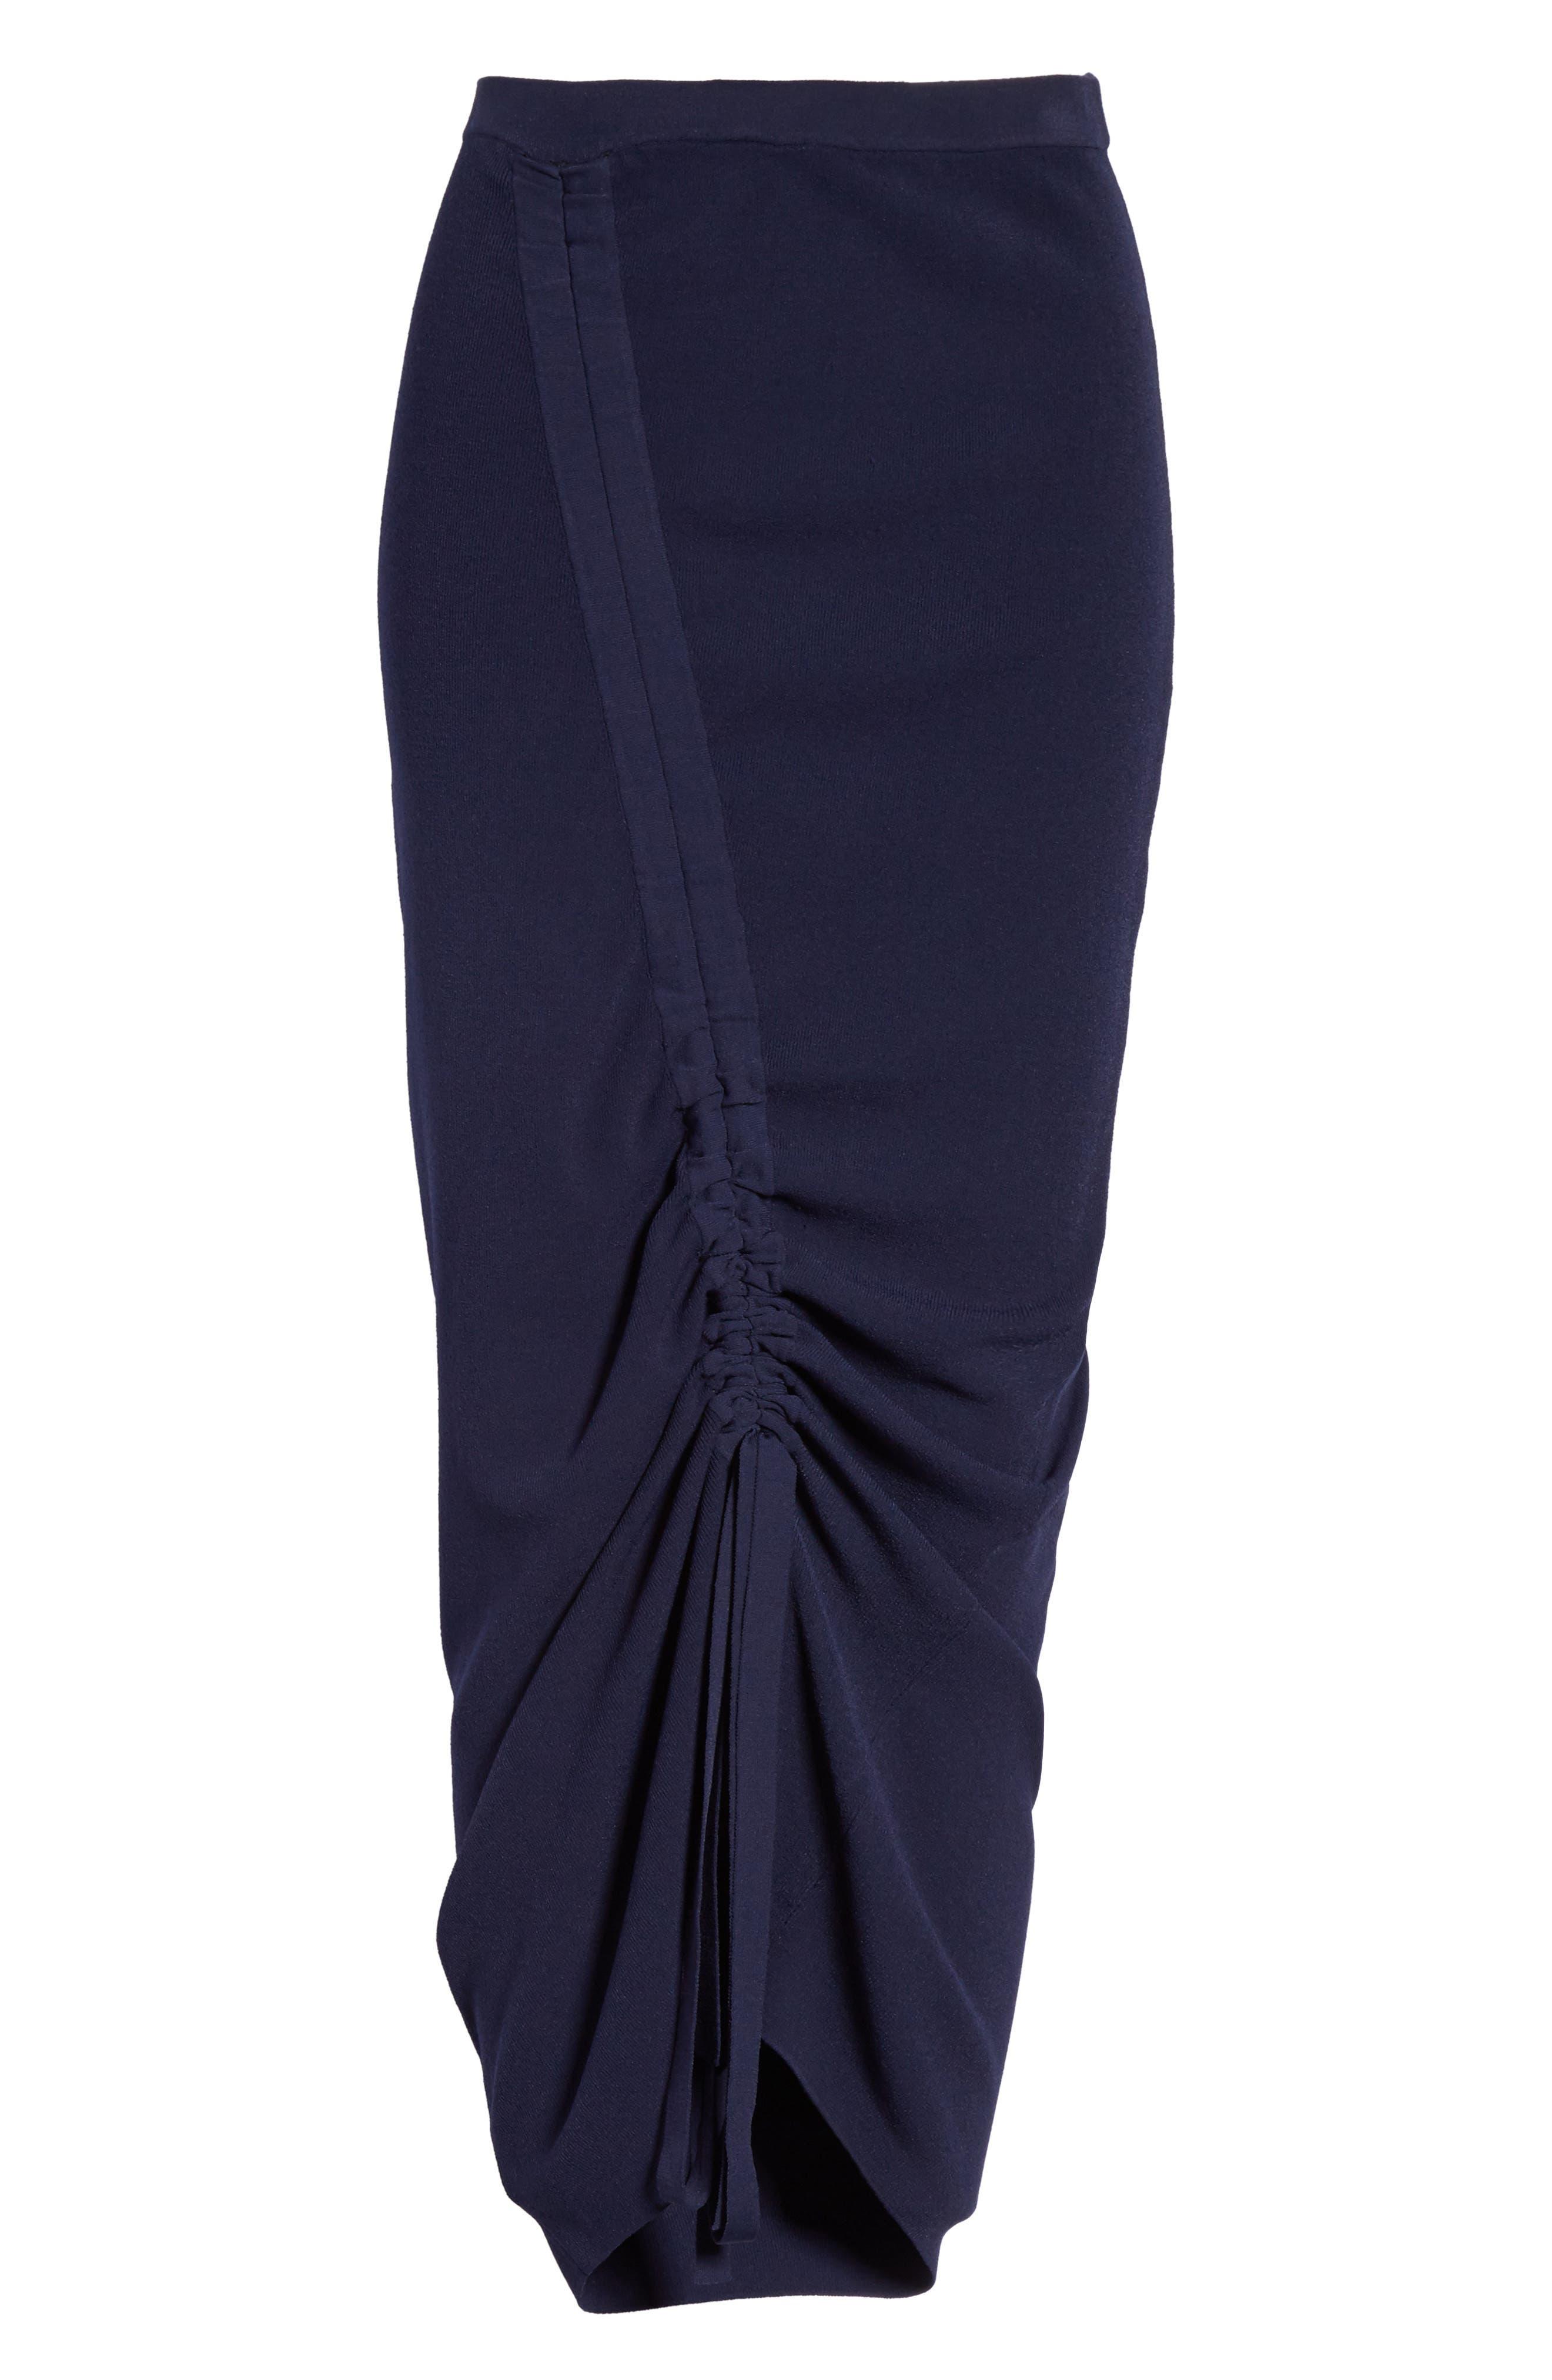 Ruched Midi Skirt,                             Alternate thumbnail 6, color,                             Navy